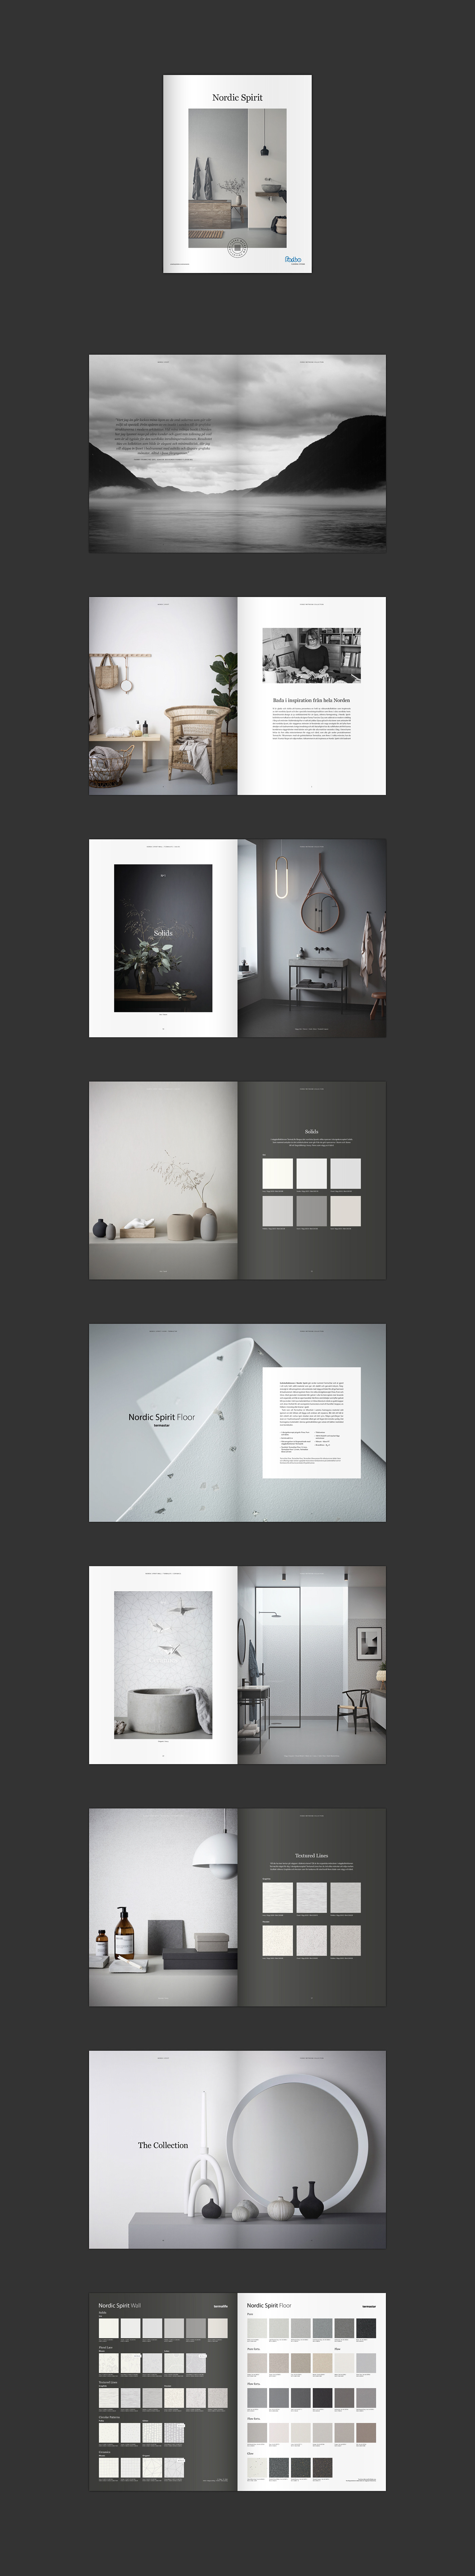 Interior,wetroom,nordic,spirit,design,grey,black and white,Forbo,minimalistic,simplicity